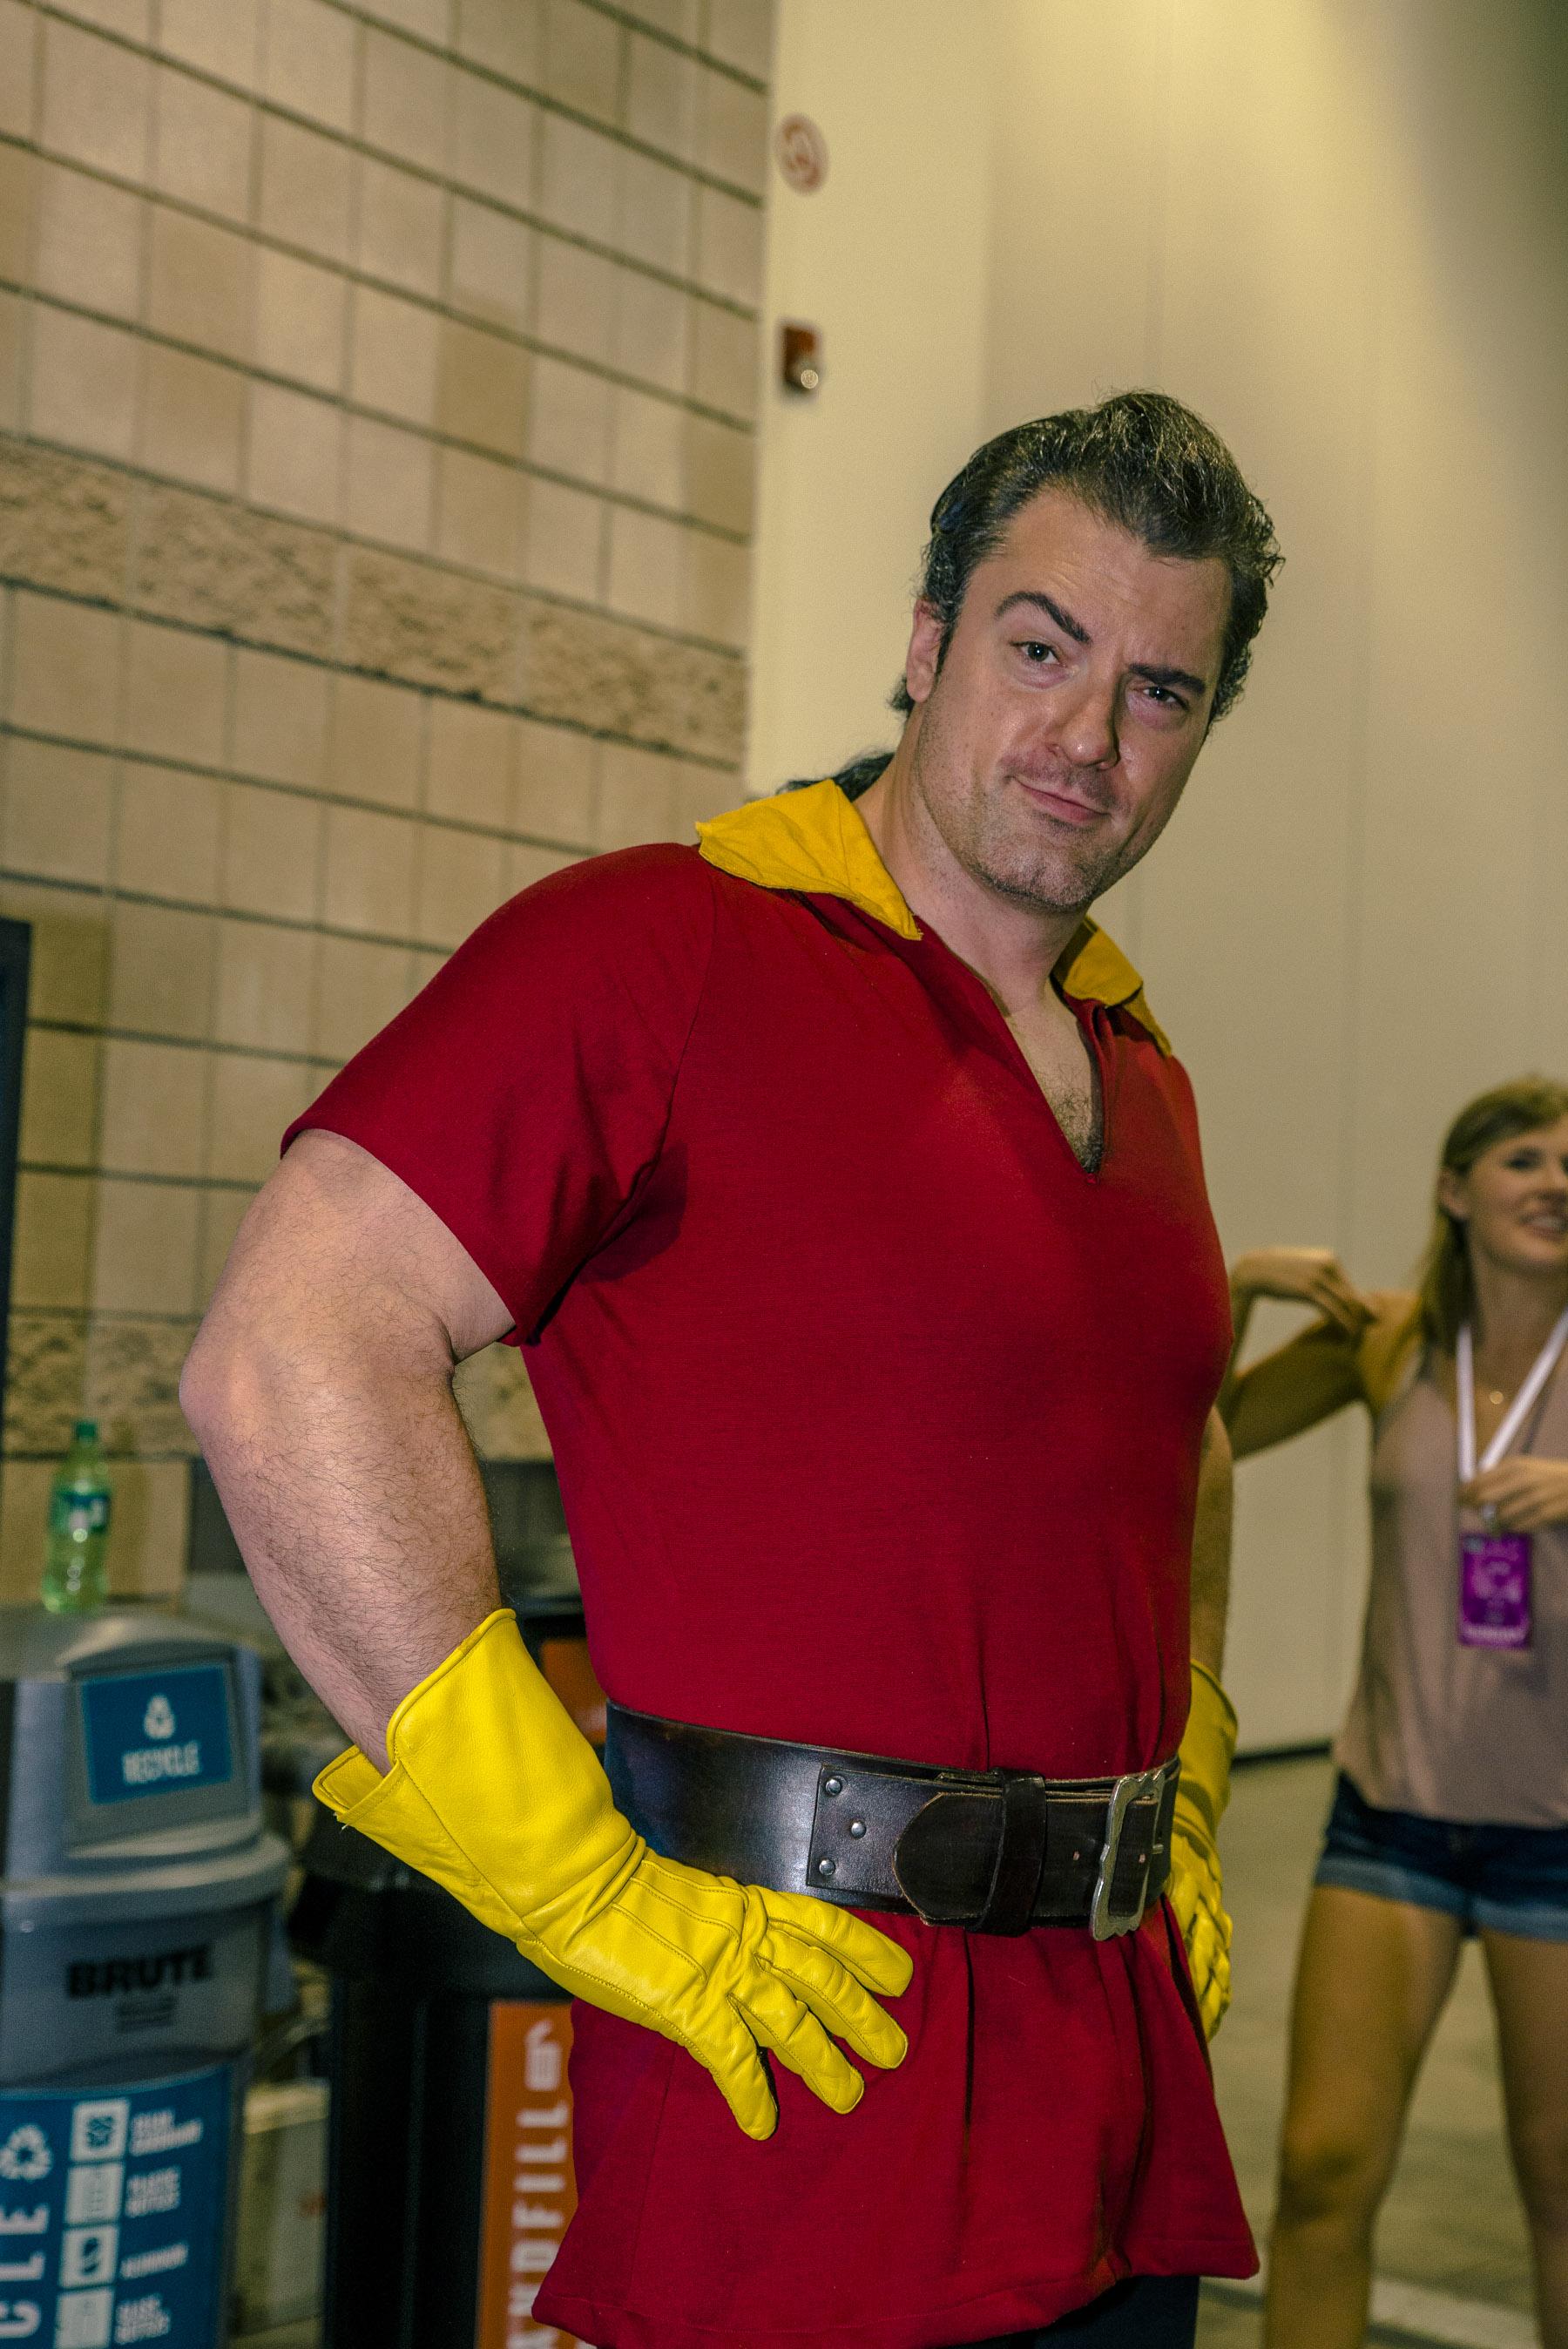 Comic Con 2018_AustinVoldseth-37.jpg